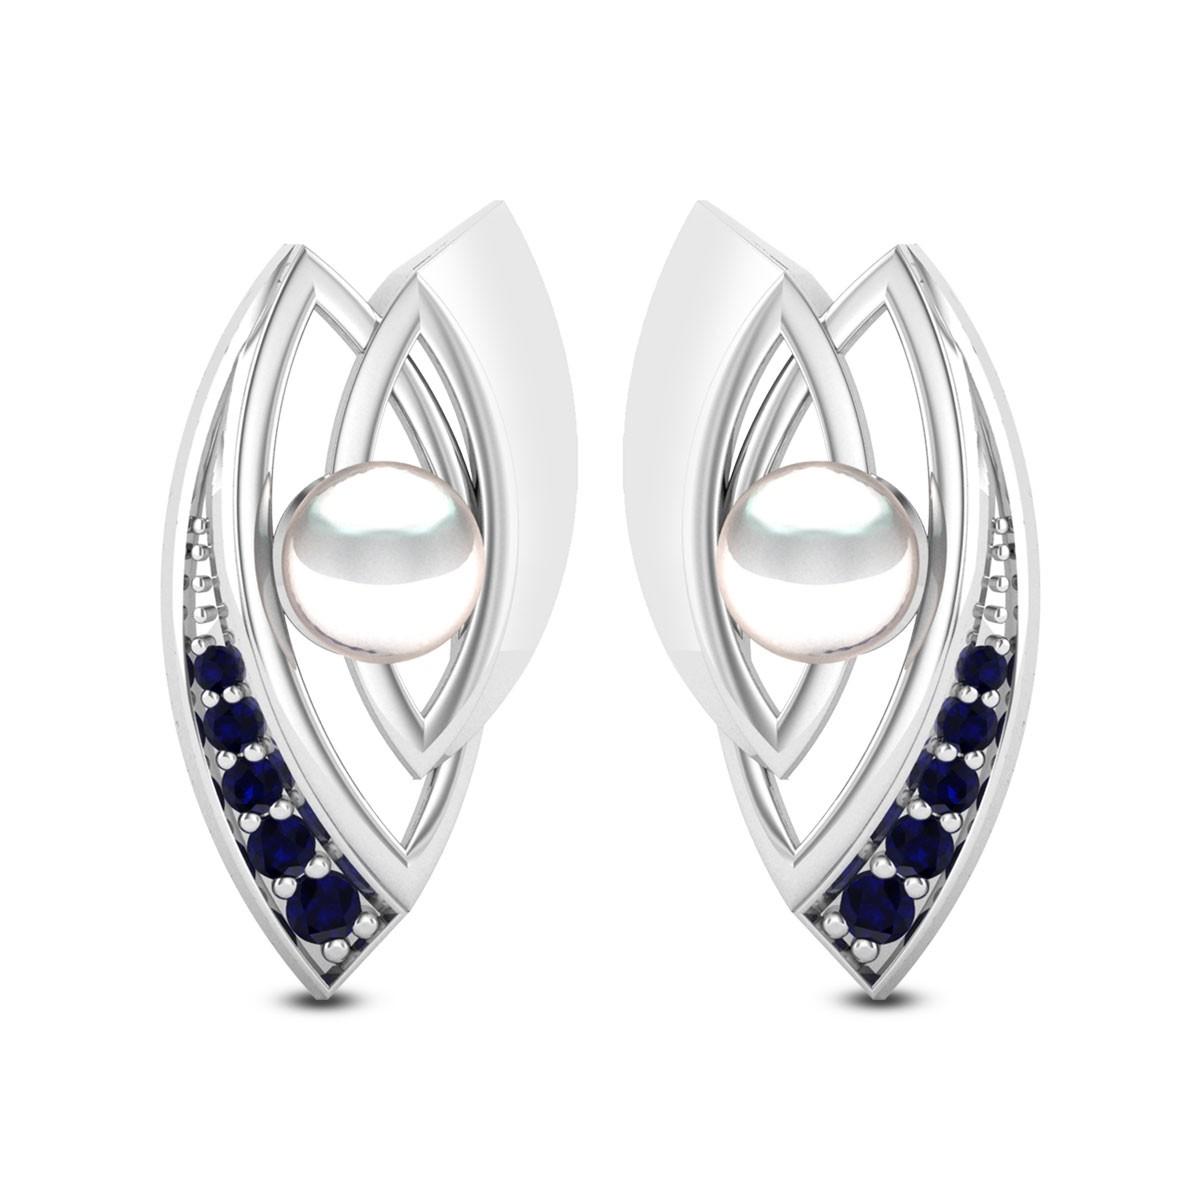 Matthiola Sapphire Stud Earrings